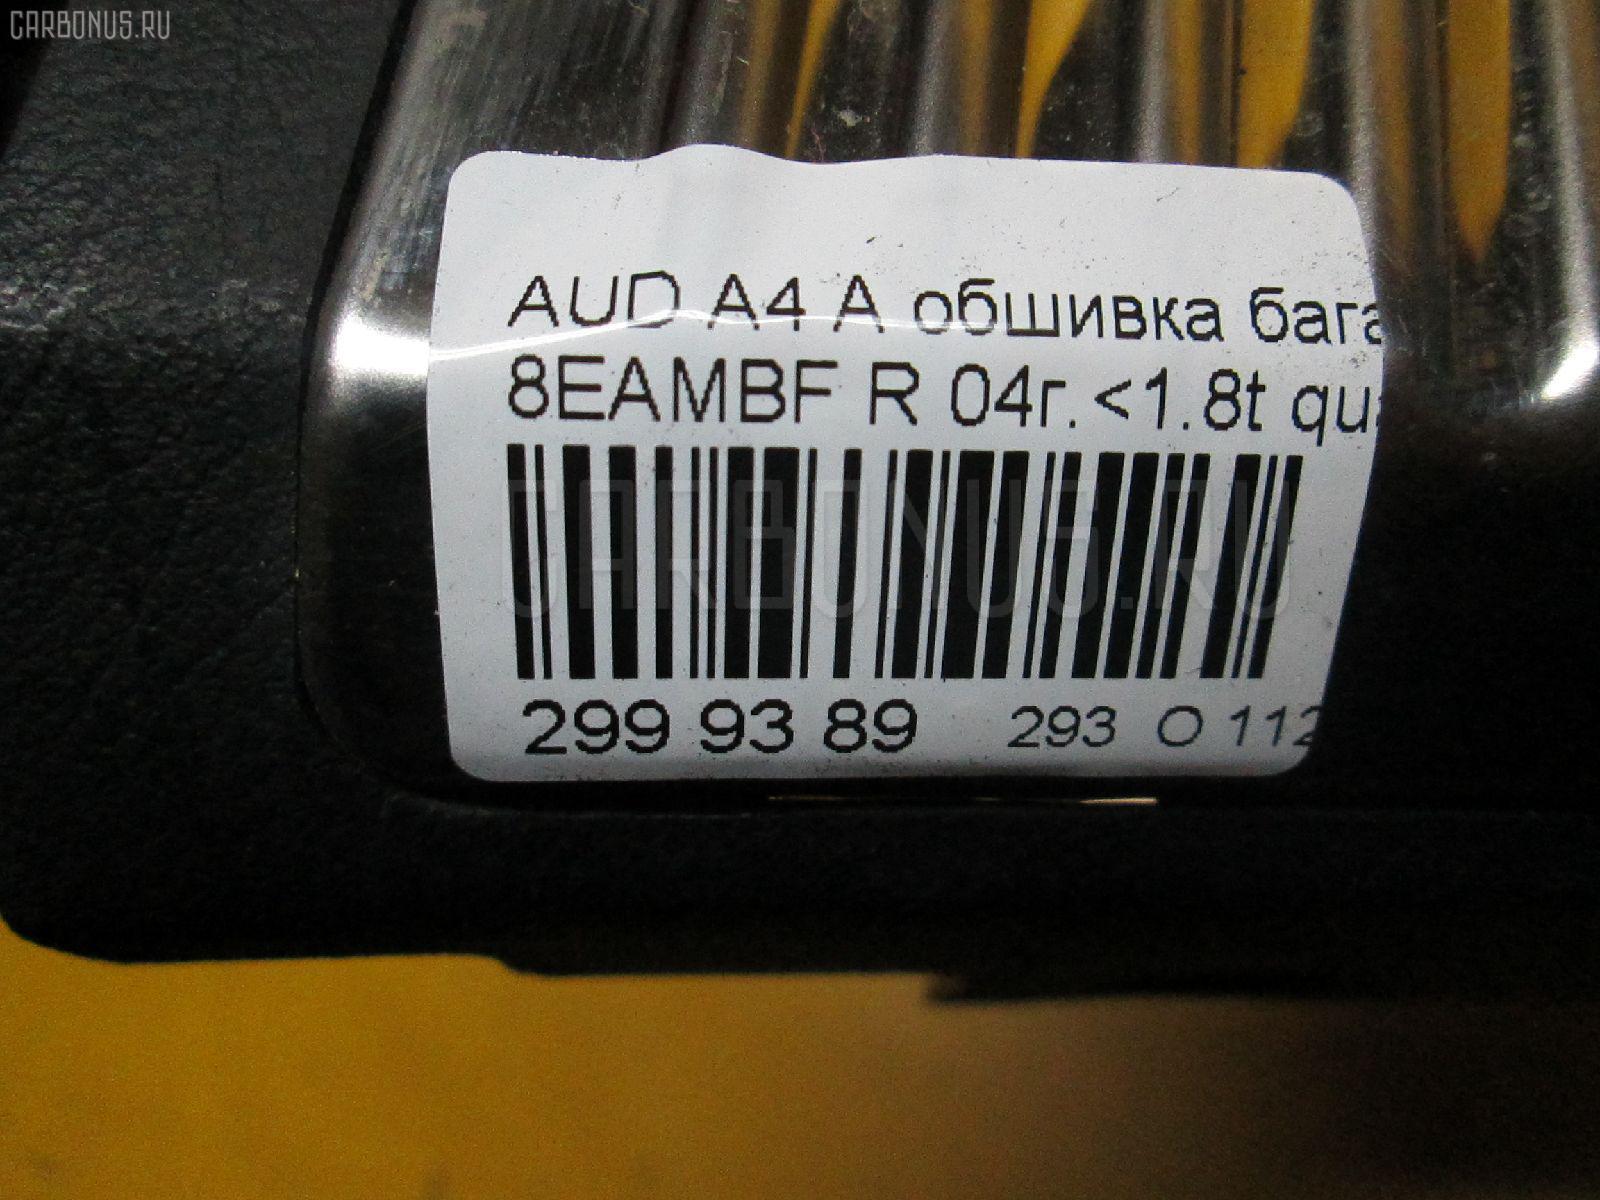 Обшивка багажника AUDI A4 AVANT 8EAMBF Фото 7